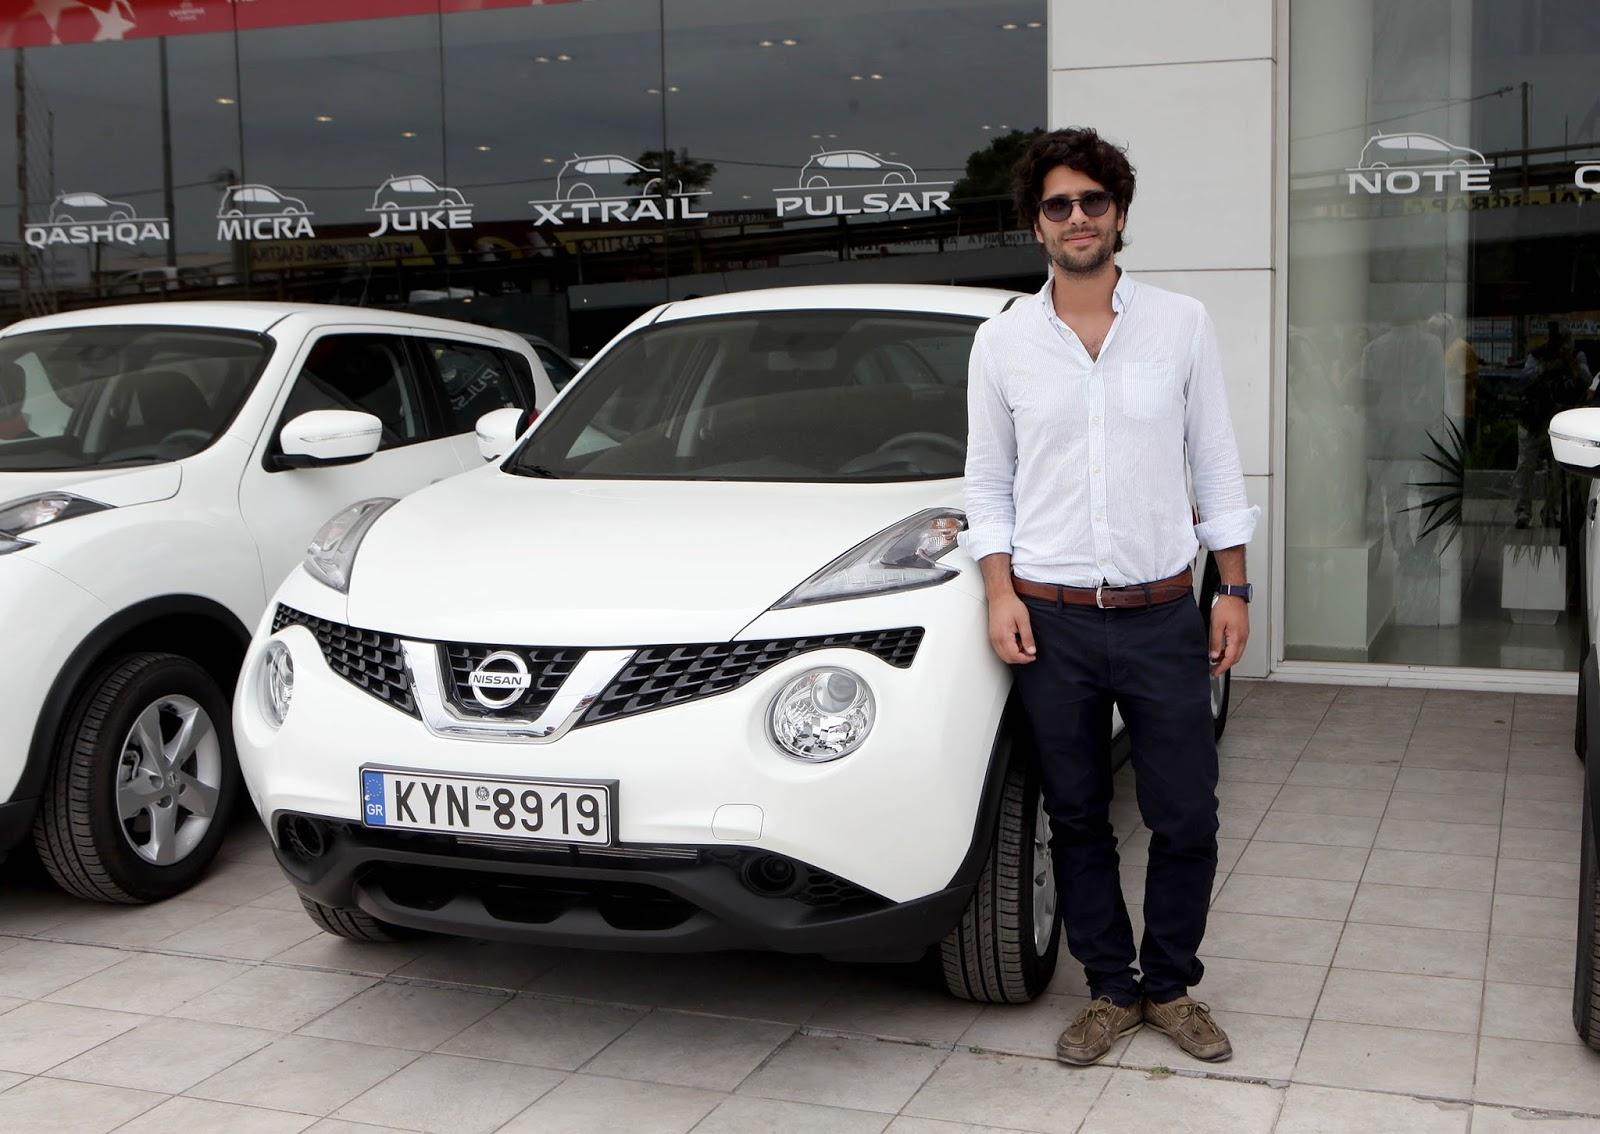 IMG 6151 Η Nissan βραβεύει με αυτοκίνητα του νικητές του GENERATION N ! Events, Future, Innovation, Nissan